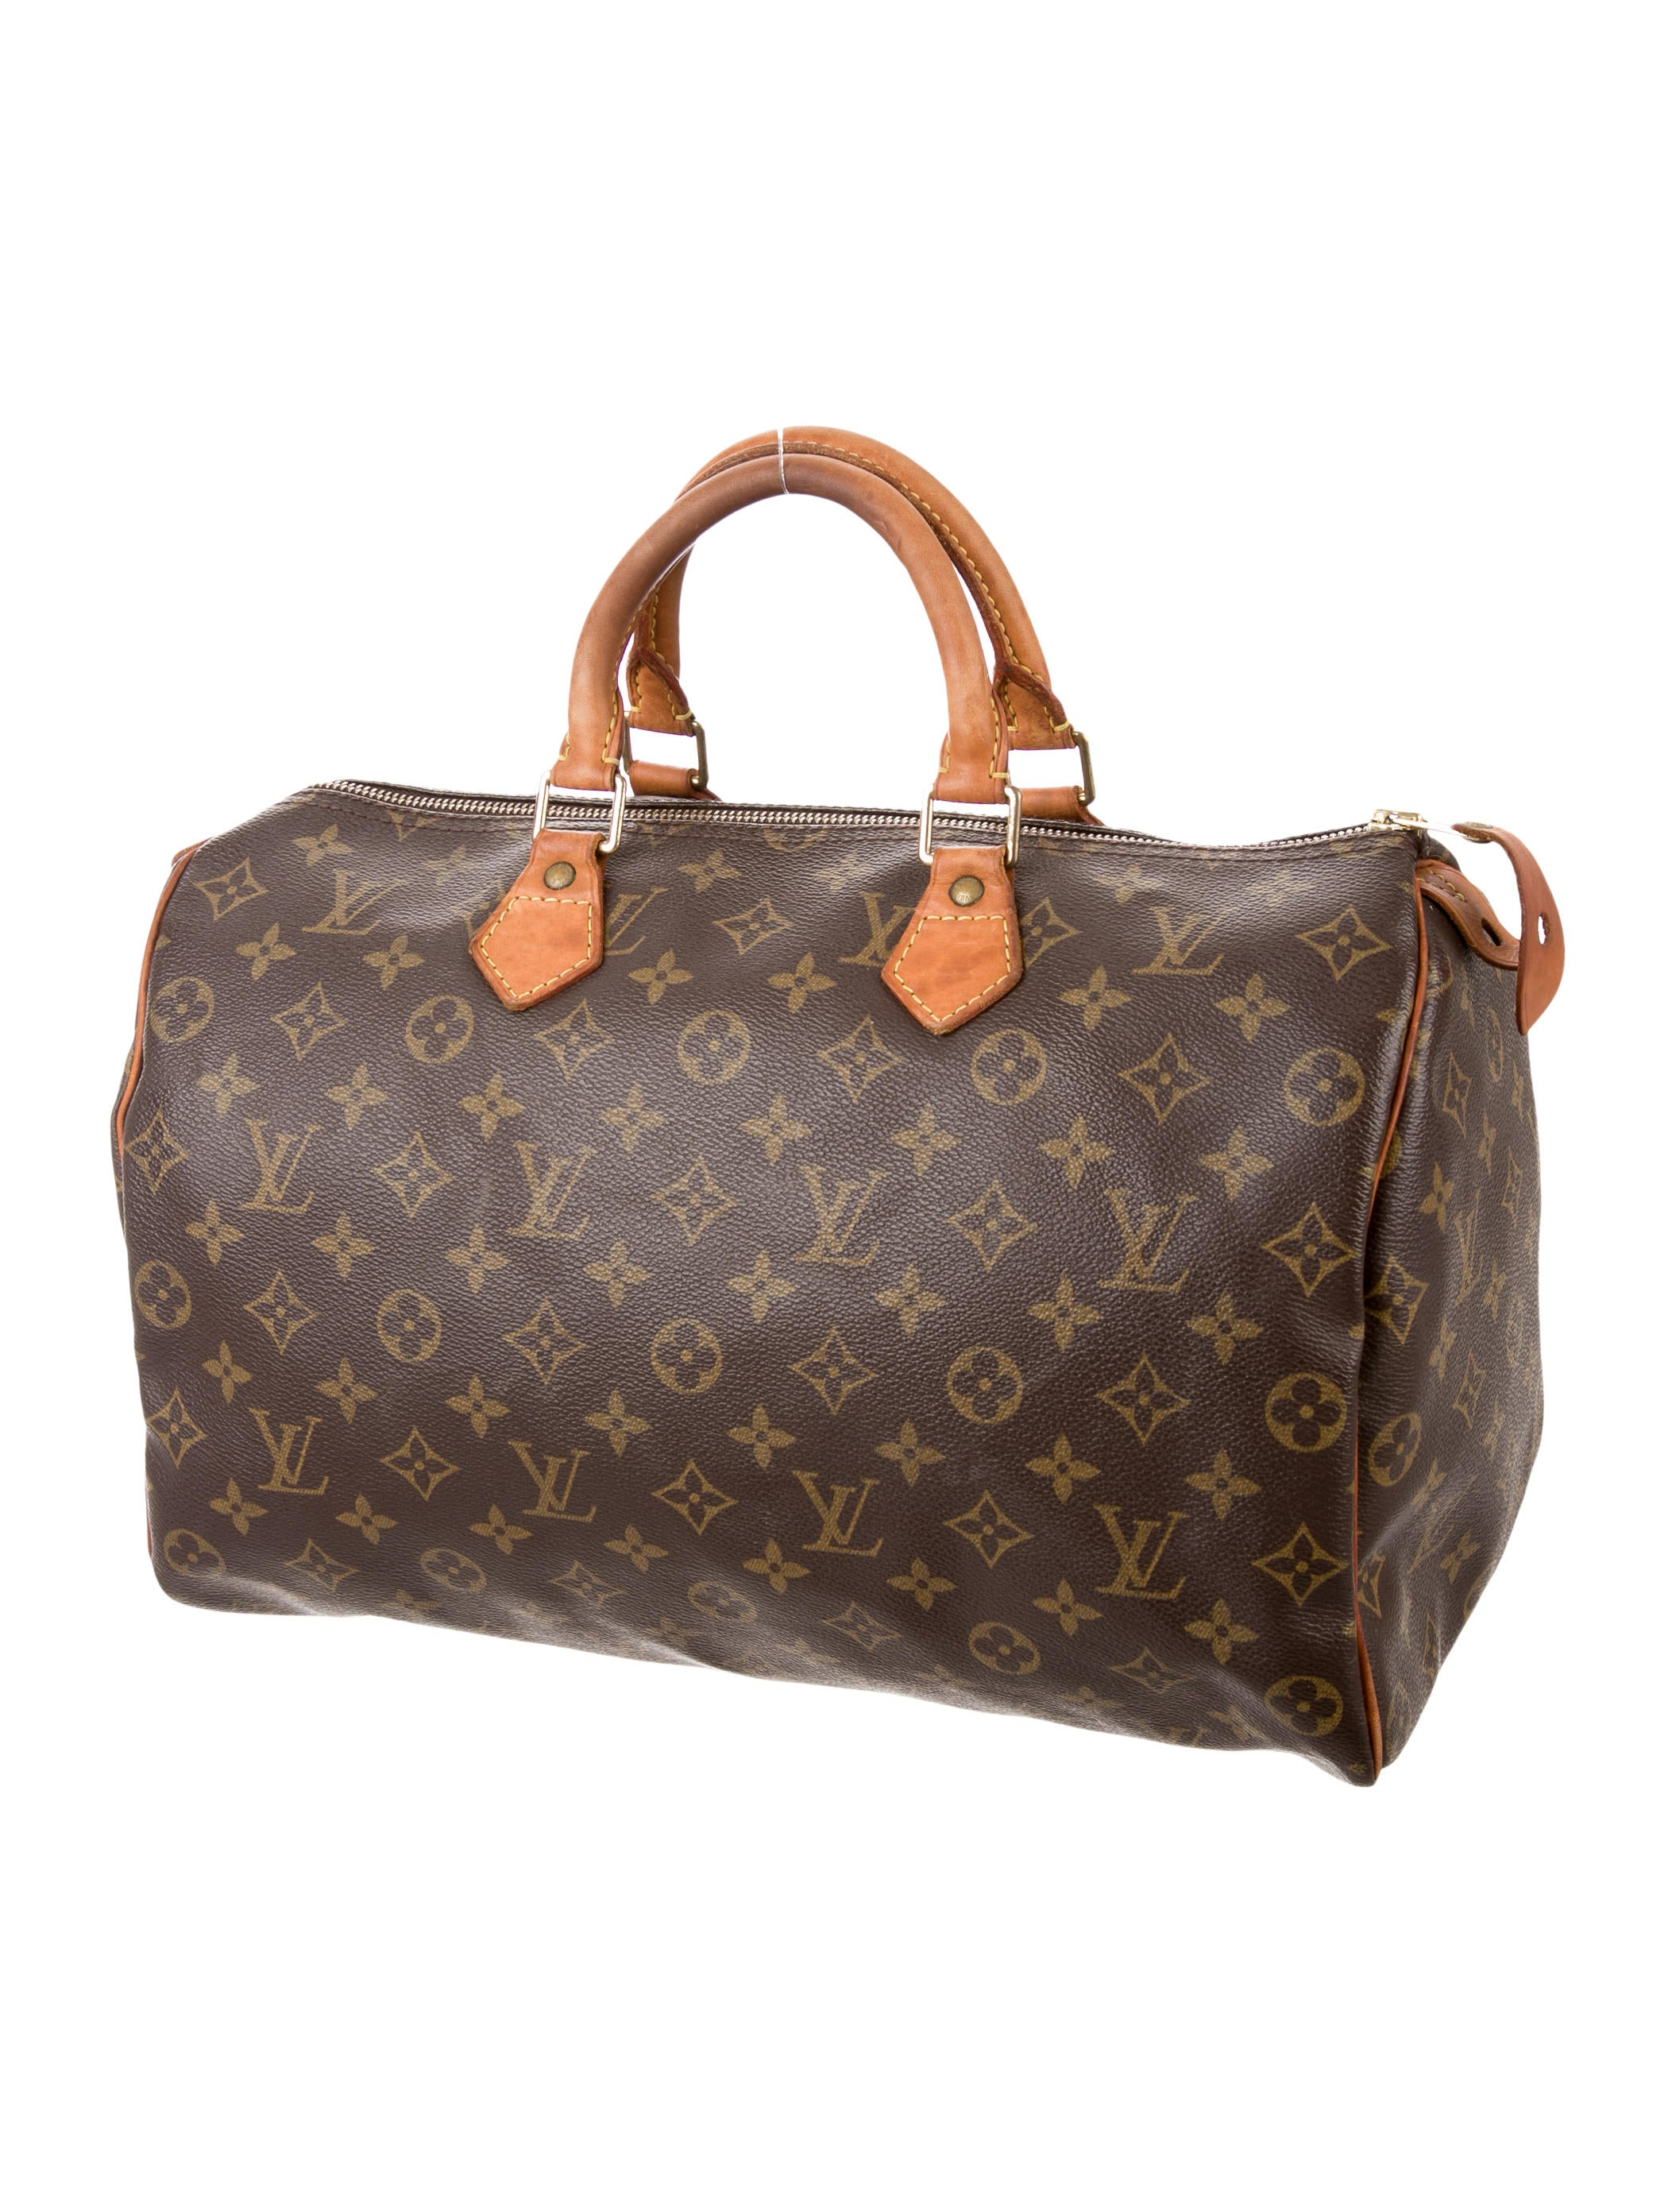 Louis vuitton monogram speedy 35 handbags lou125064 for Louis vuitton miroir speedy 35